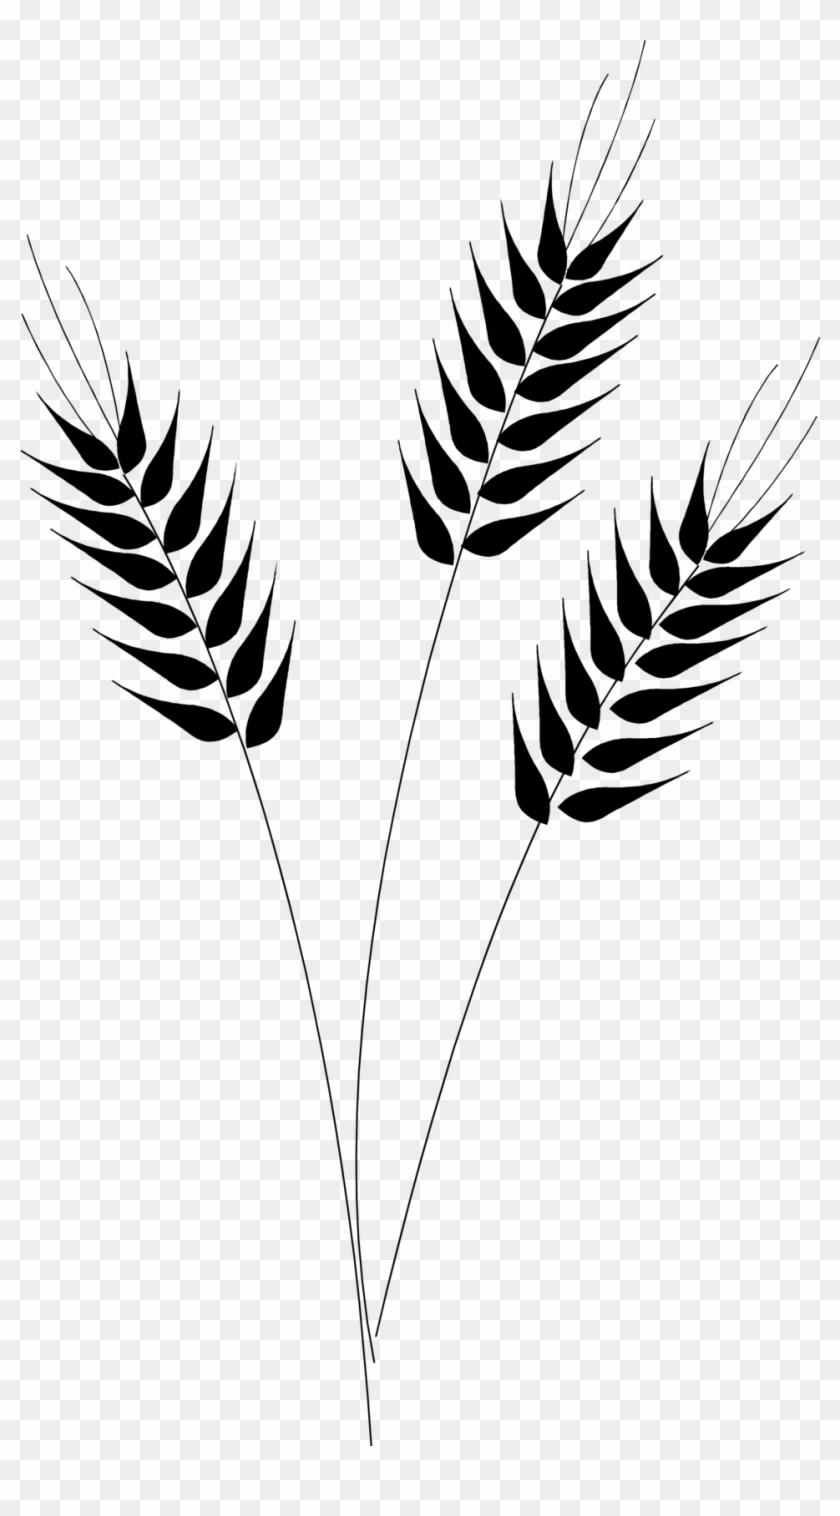 Wheat clipart wheat stock. Leaf x free clip